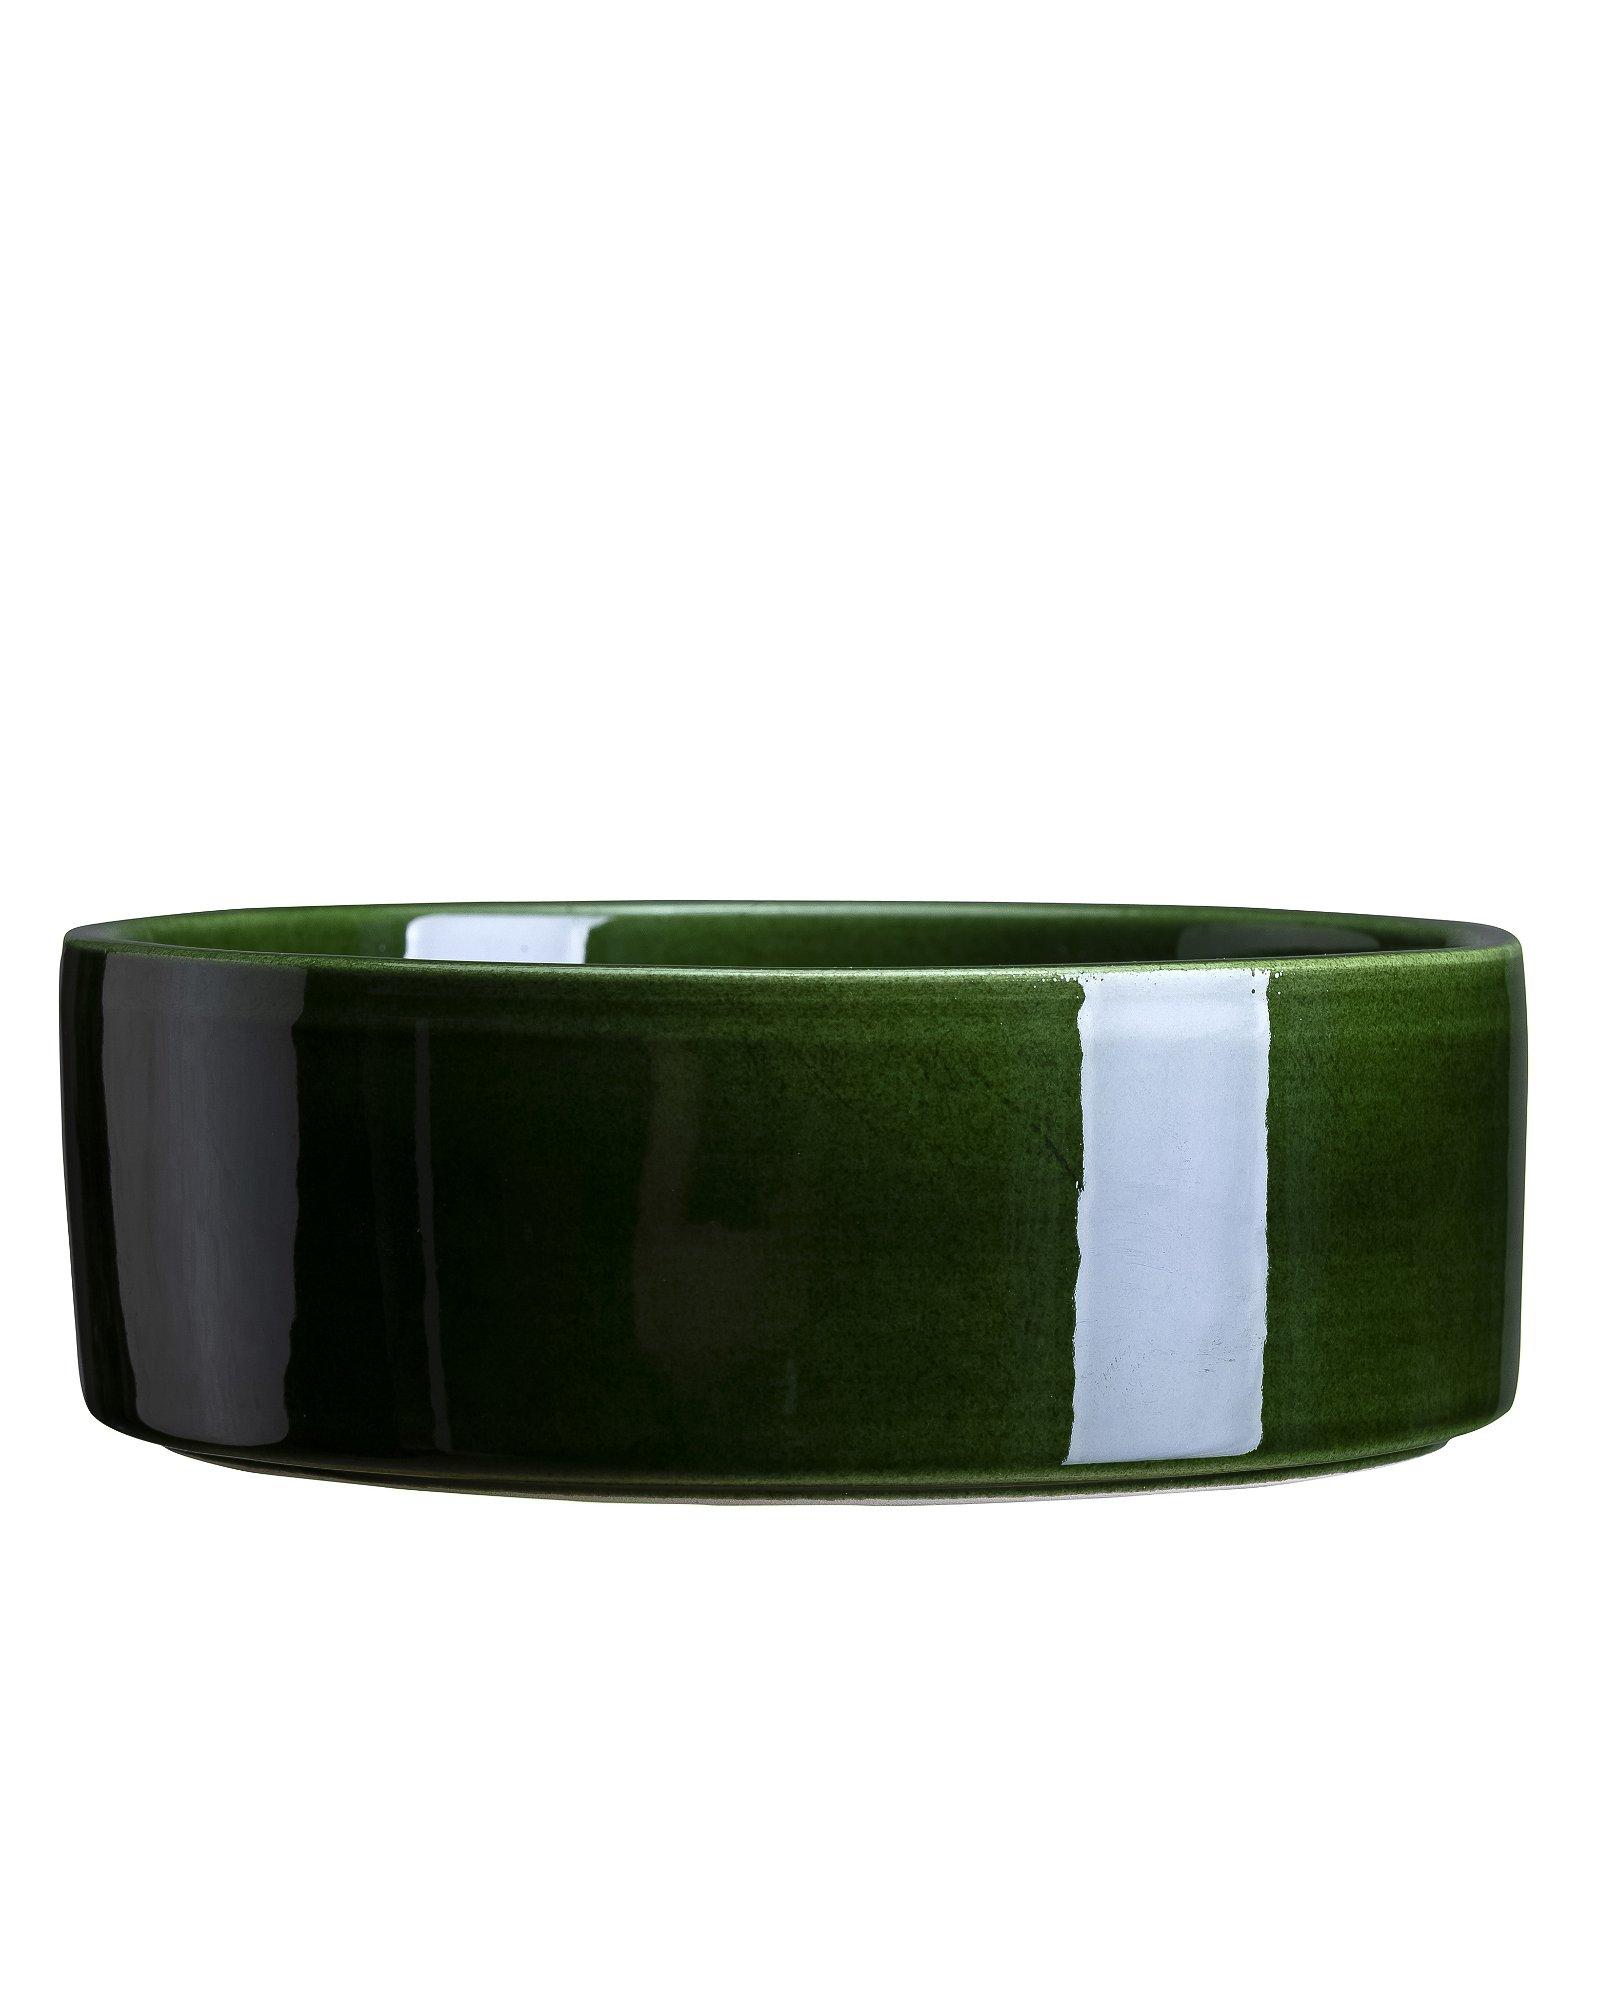 Bergs Potter, The Hoff Pot GLAZED: Emerald Green, 30 cm, Underfad